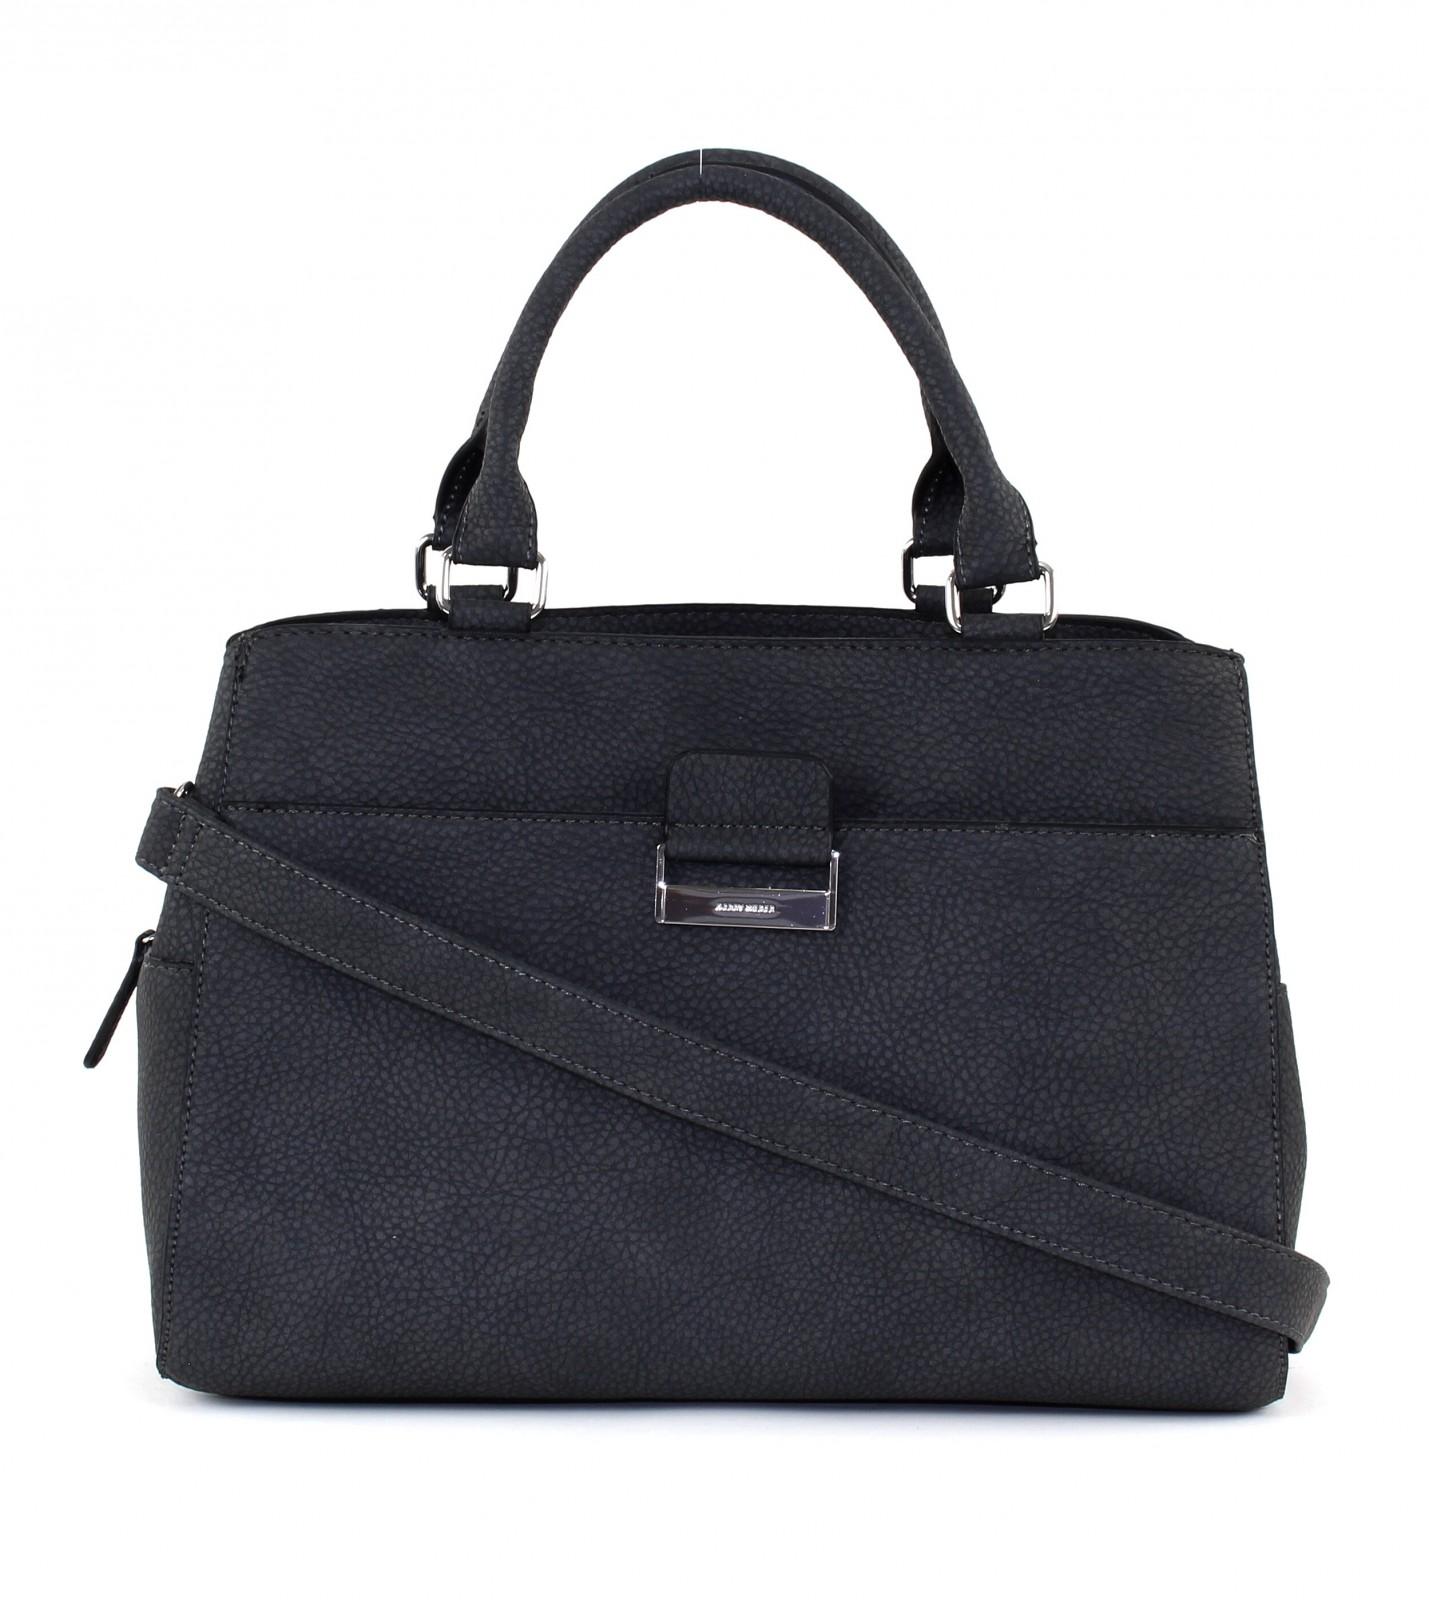 gerry weber handbag talk different ii l dark grey. Black Bedroom Furniture Sets. Home Design Ideas